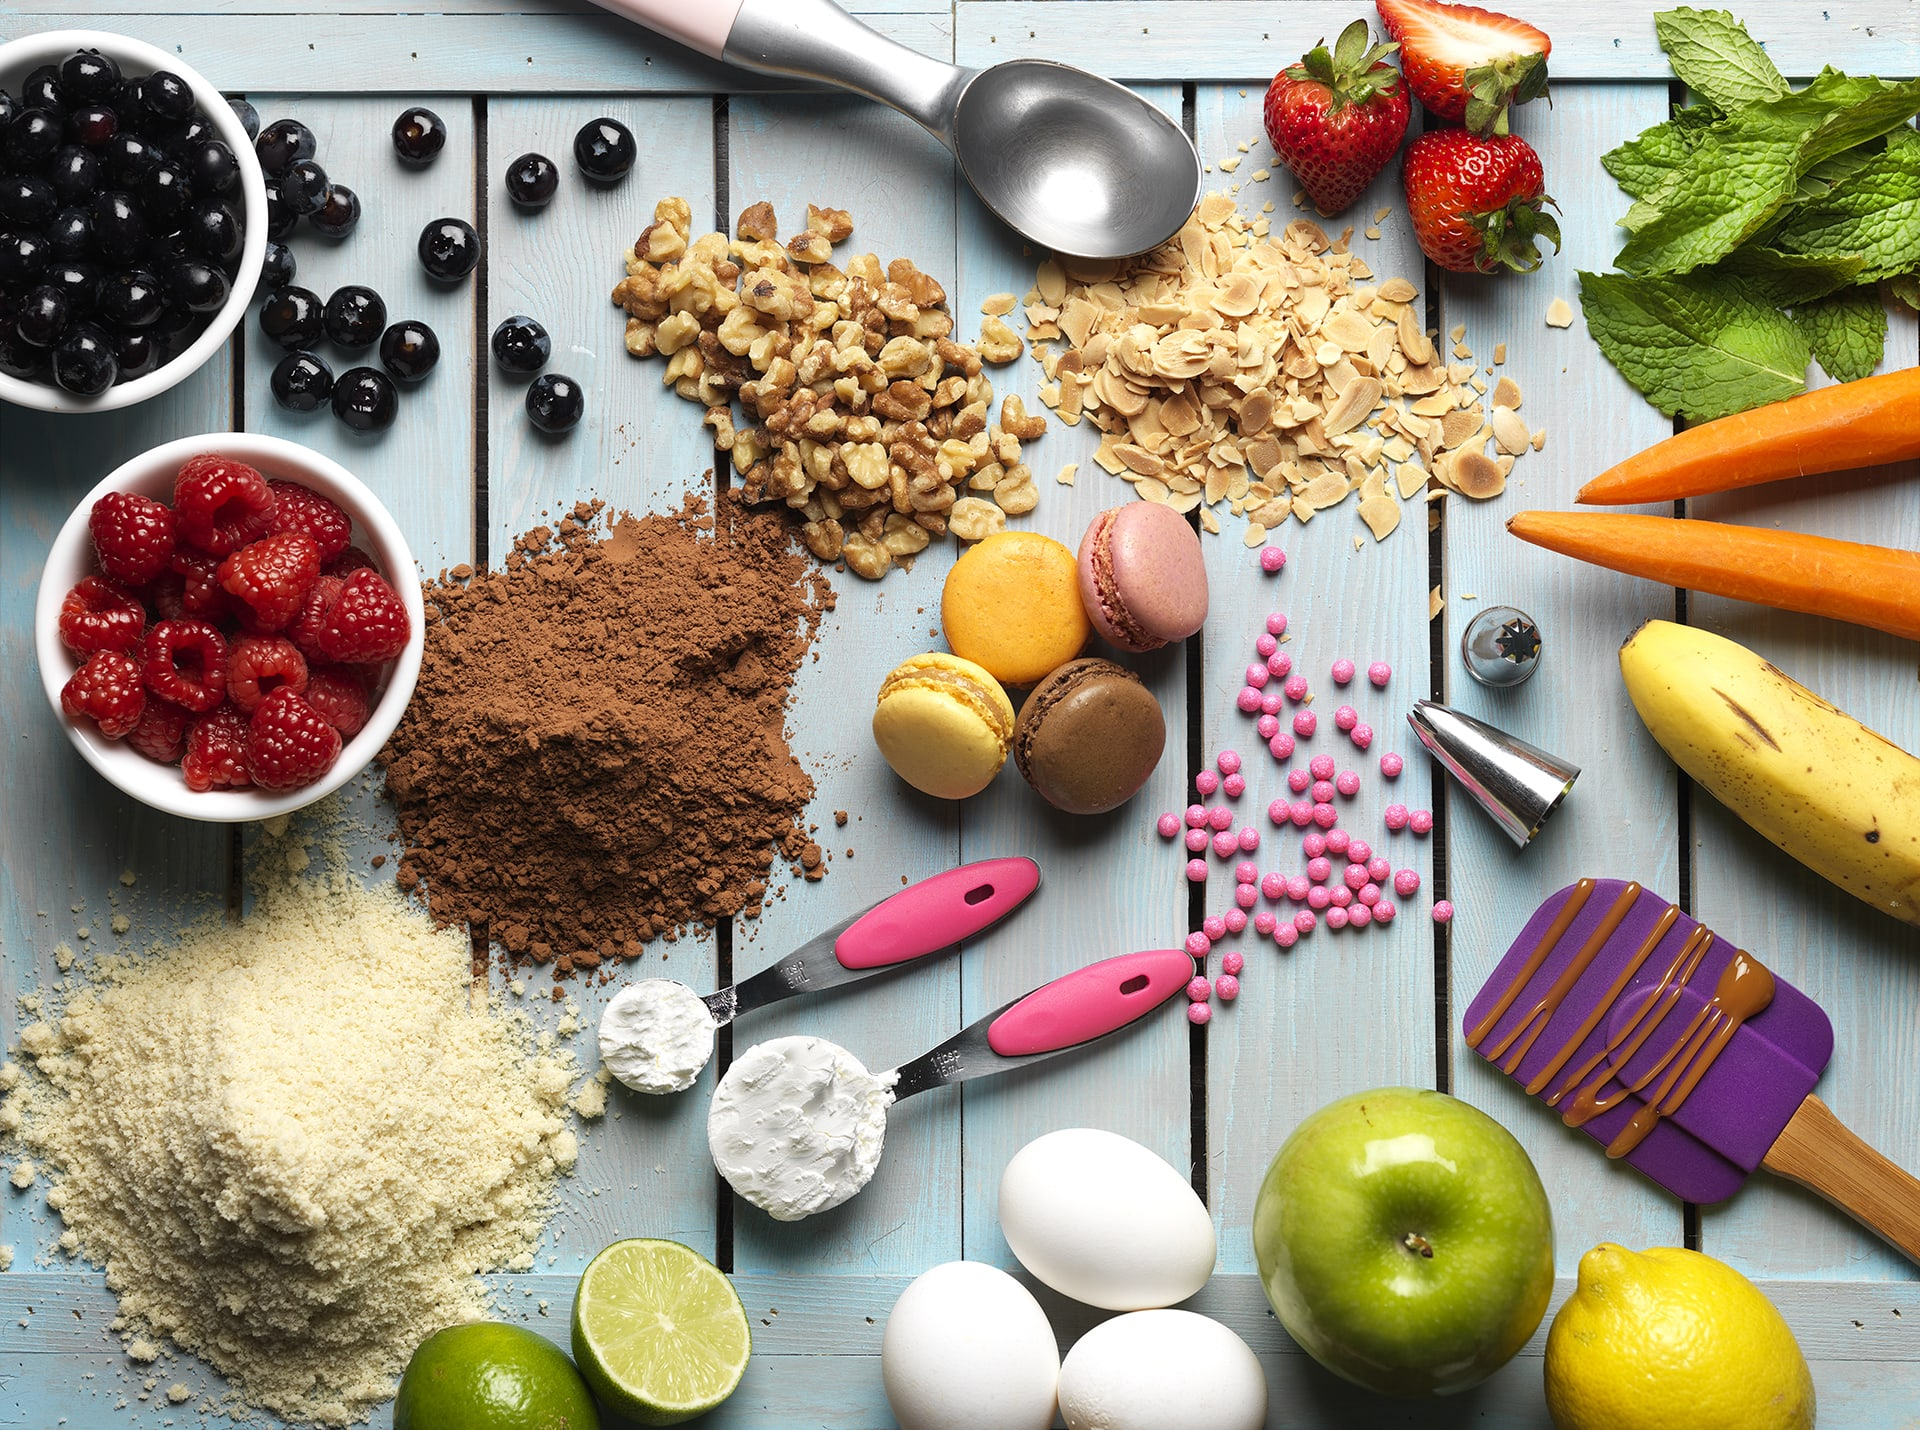 color-food-photography-miami-marcel-boldu.jpg